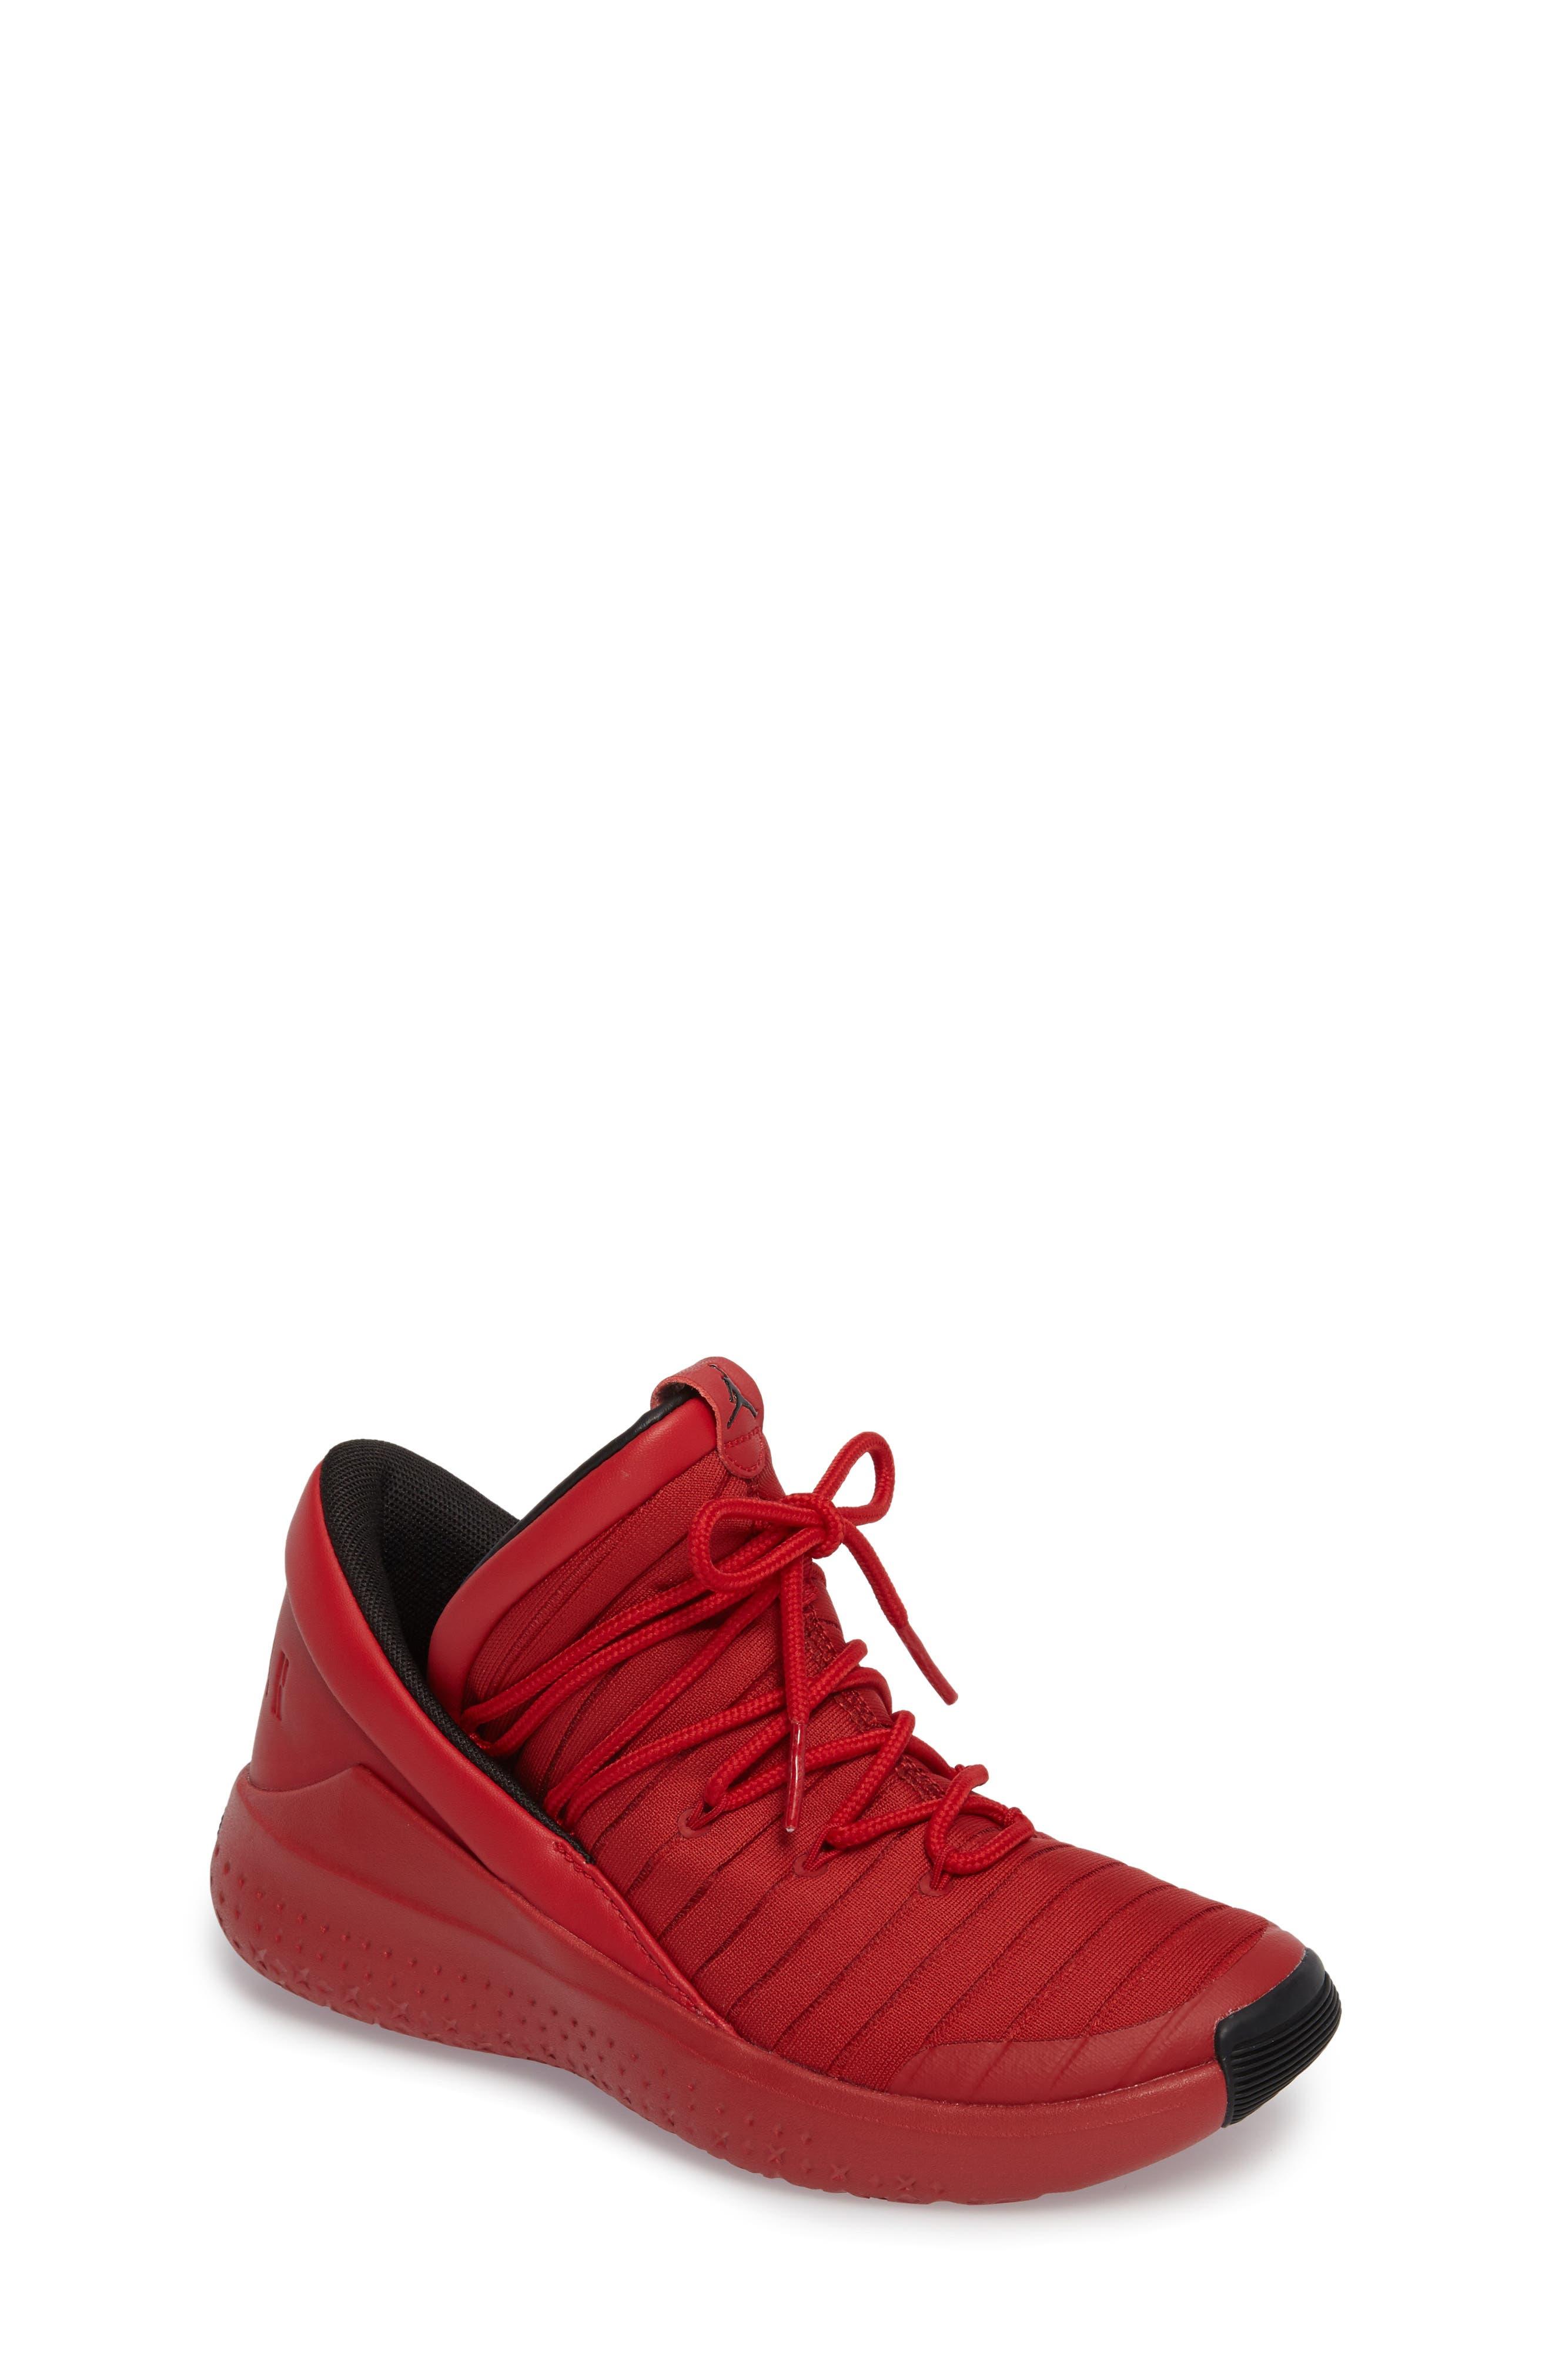 Alternate Image 1 Selected - Nike Jordan Flight Luxe Sneaker (Big Kid)